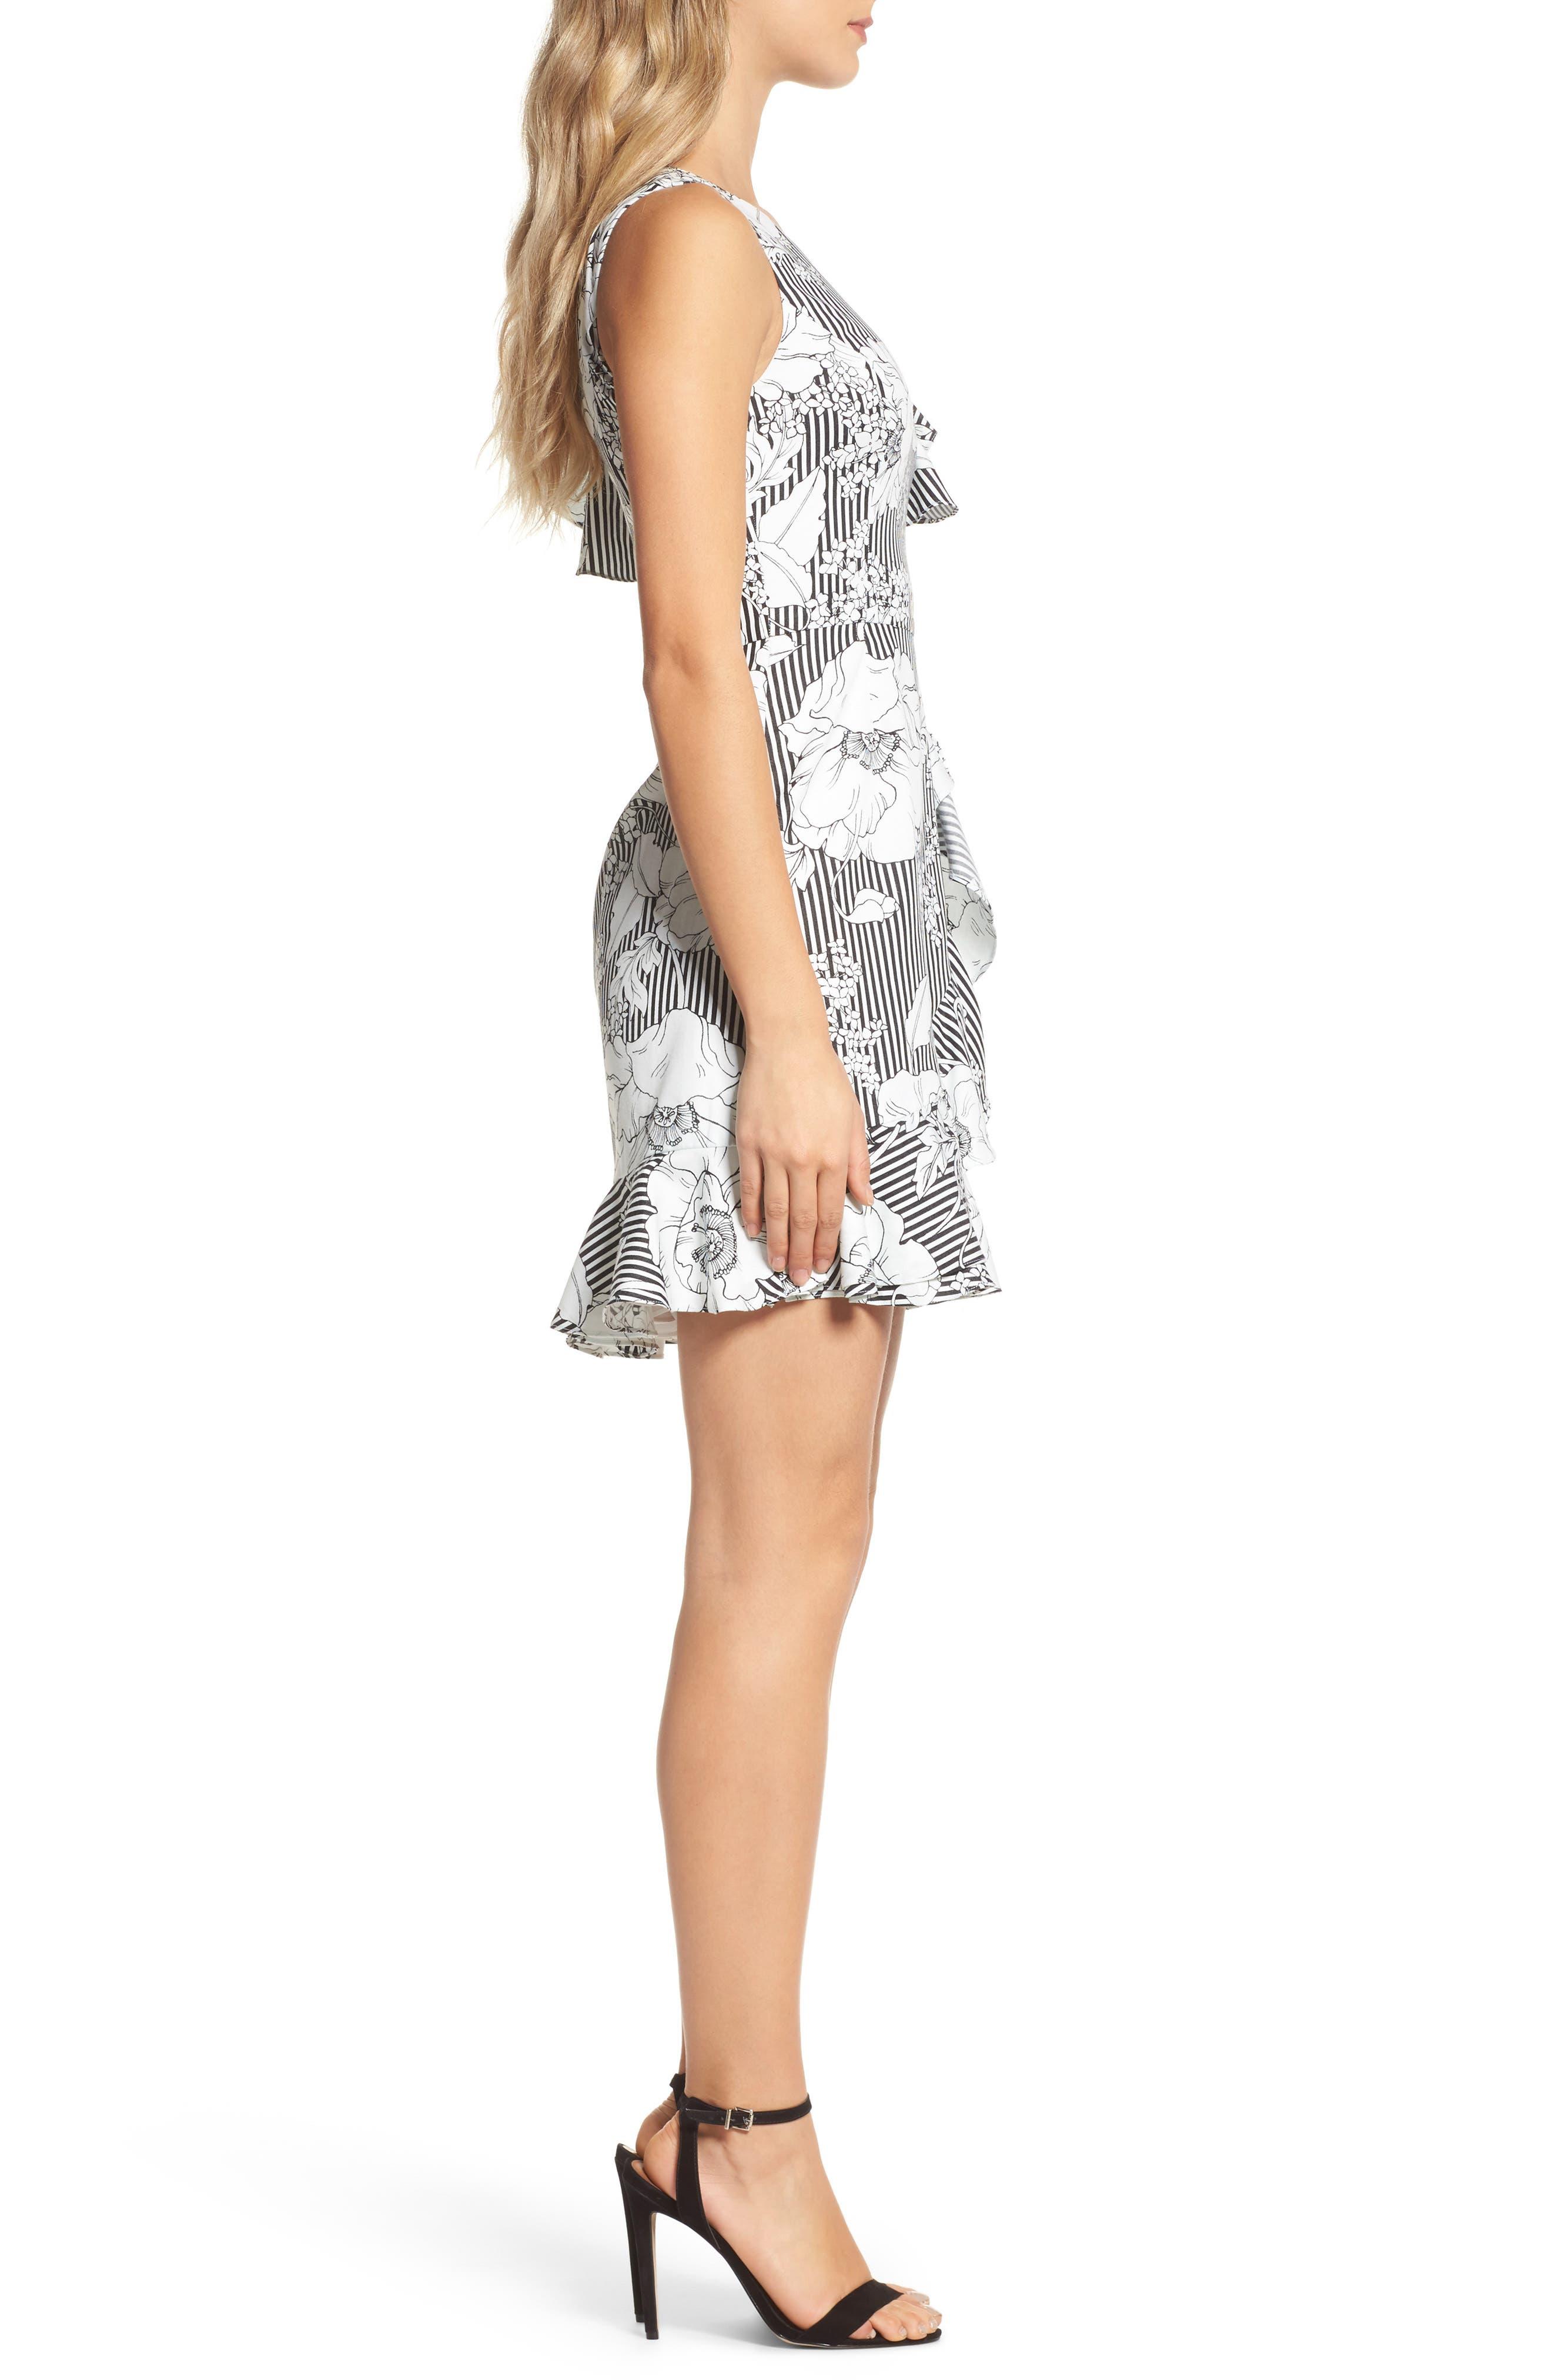 CHARLES HENRY, Floral Asymmetrical Ruffle Dress, Alternate thumbnail 3, color, 018